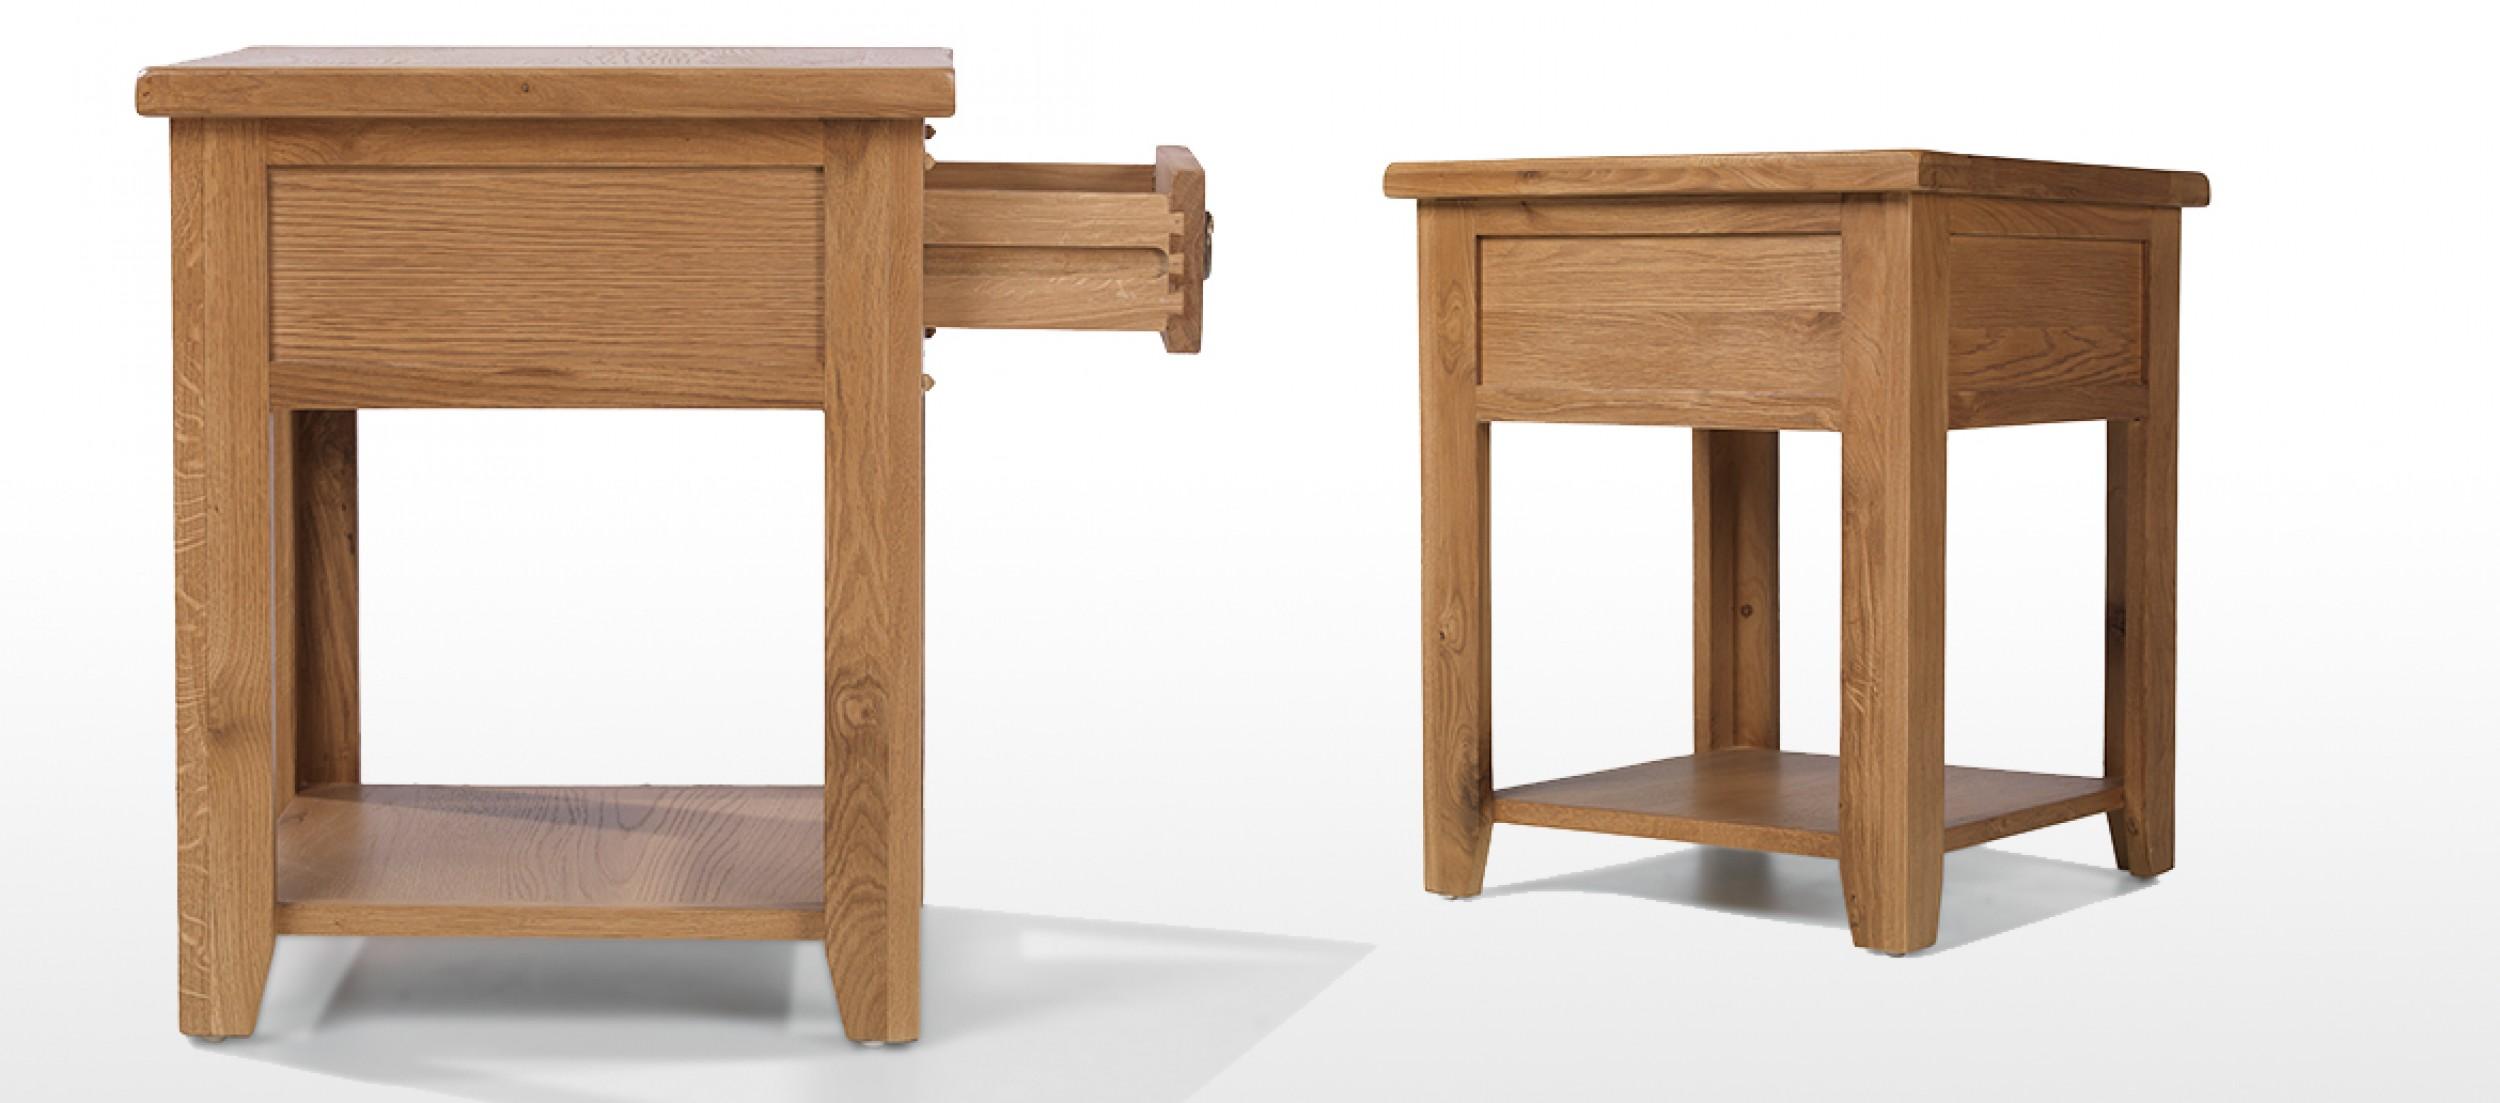 Rustic oak lamp table quercus living rustic oak lamp table aloadofball Image collections